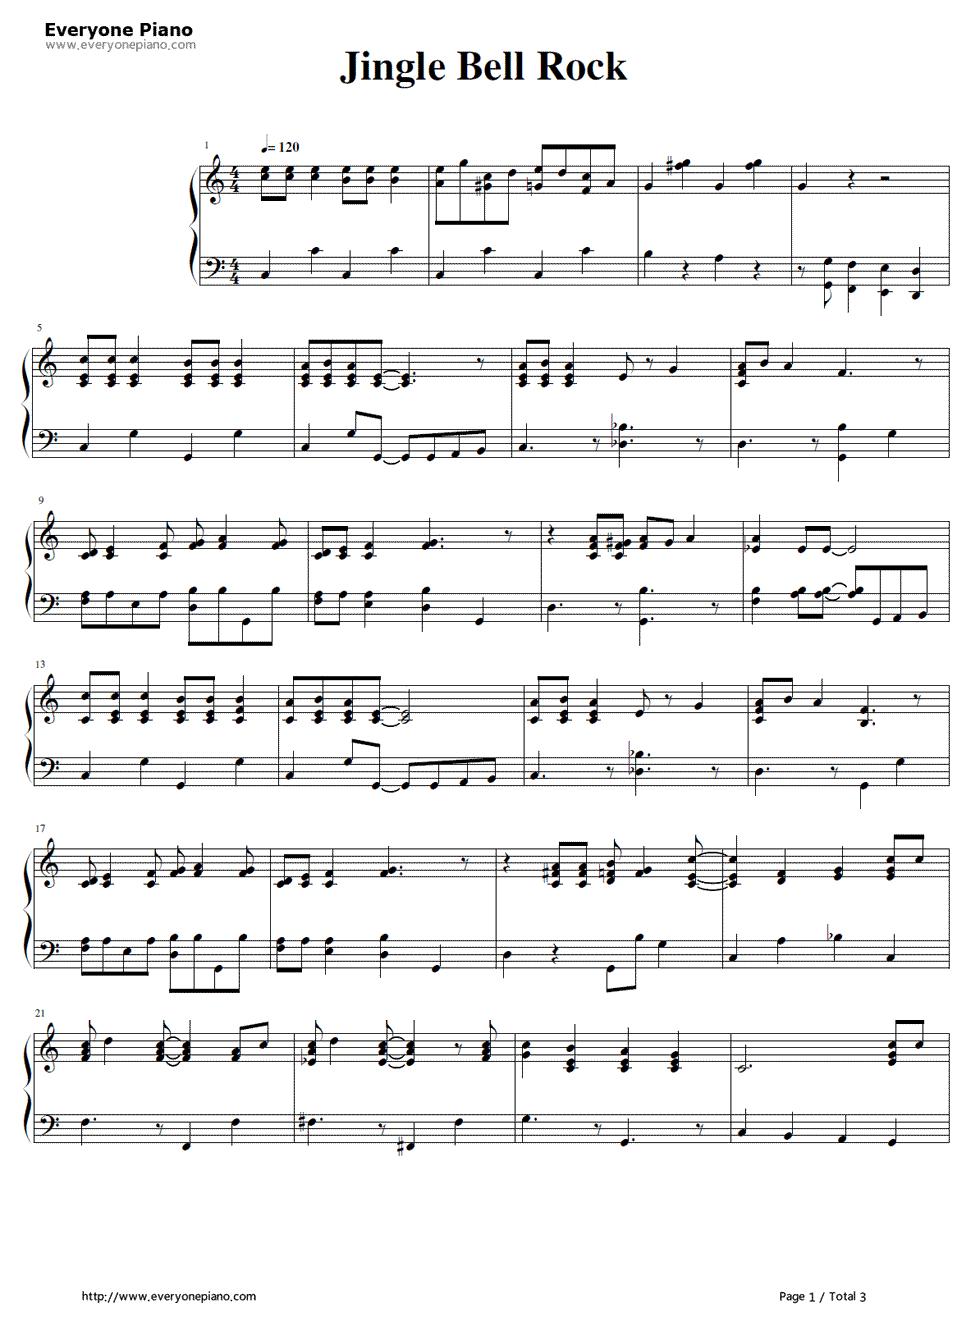 Jingle Bell Rock Bobby Helms Stave Preview 1 Jingle Bells Sheet Music Piano Music Christmas Sheet Music